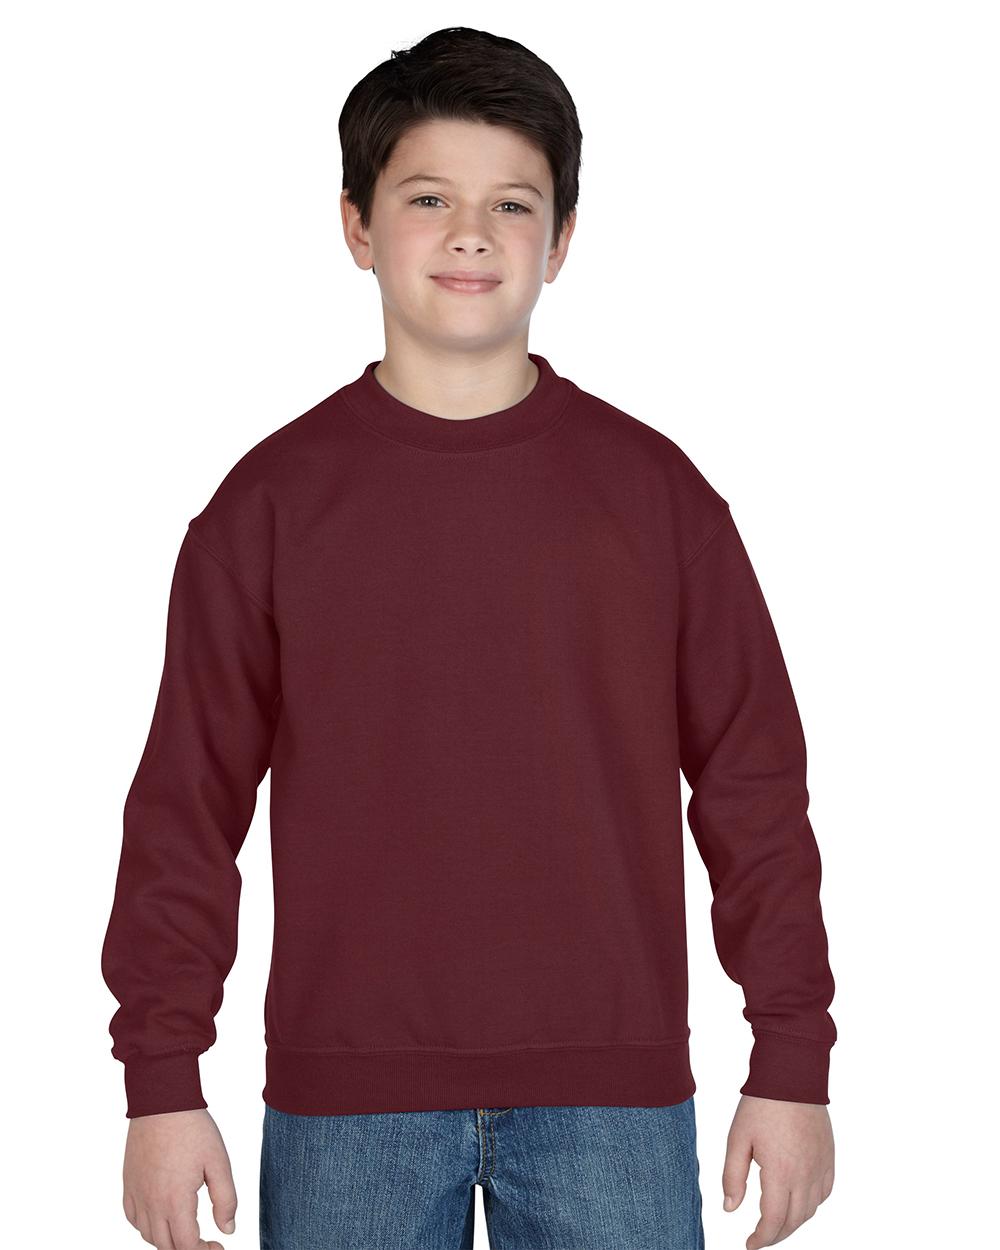 Gildan 18000B     Classic Fit Youth Crewneck Sweatshirt    50% Cotton / 50% Polyester Fleece